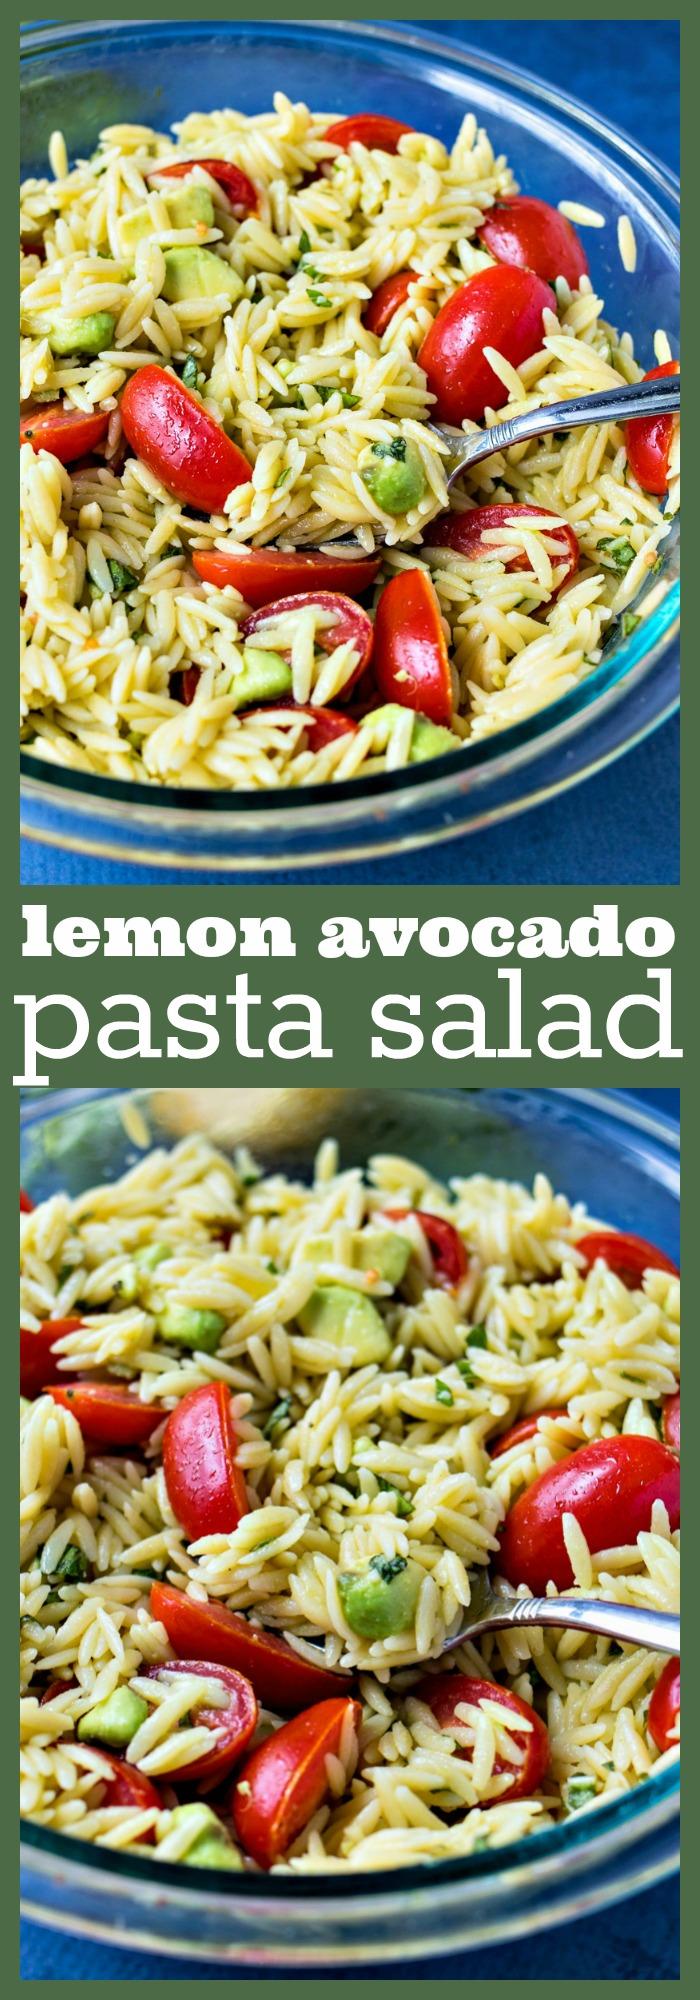 Lemon Avocado Pasta Salad photo collage